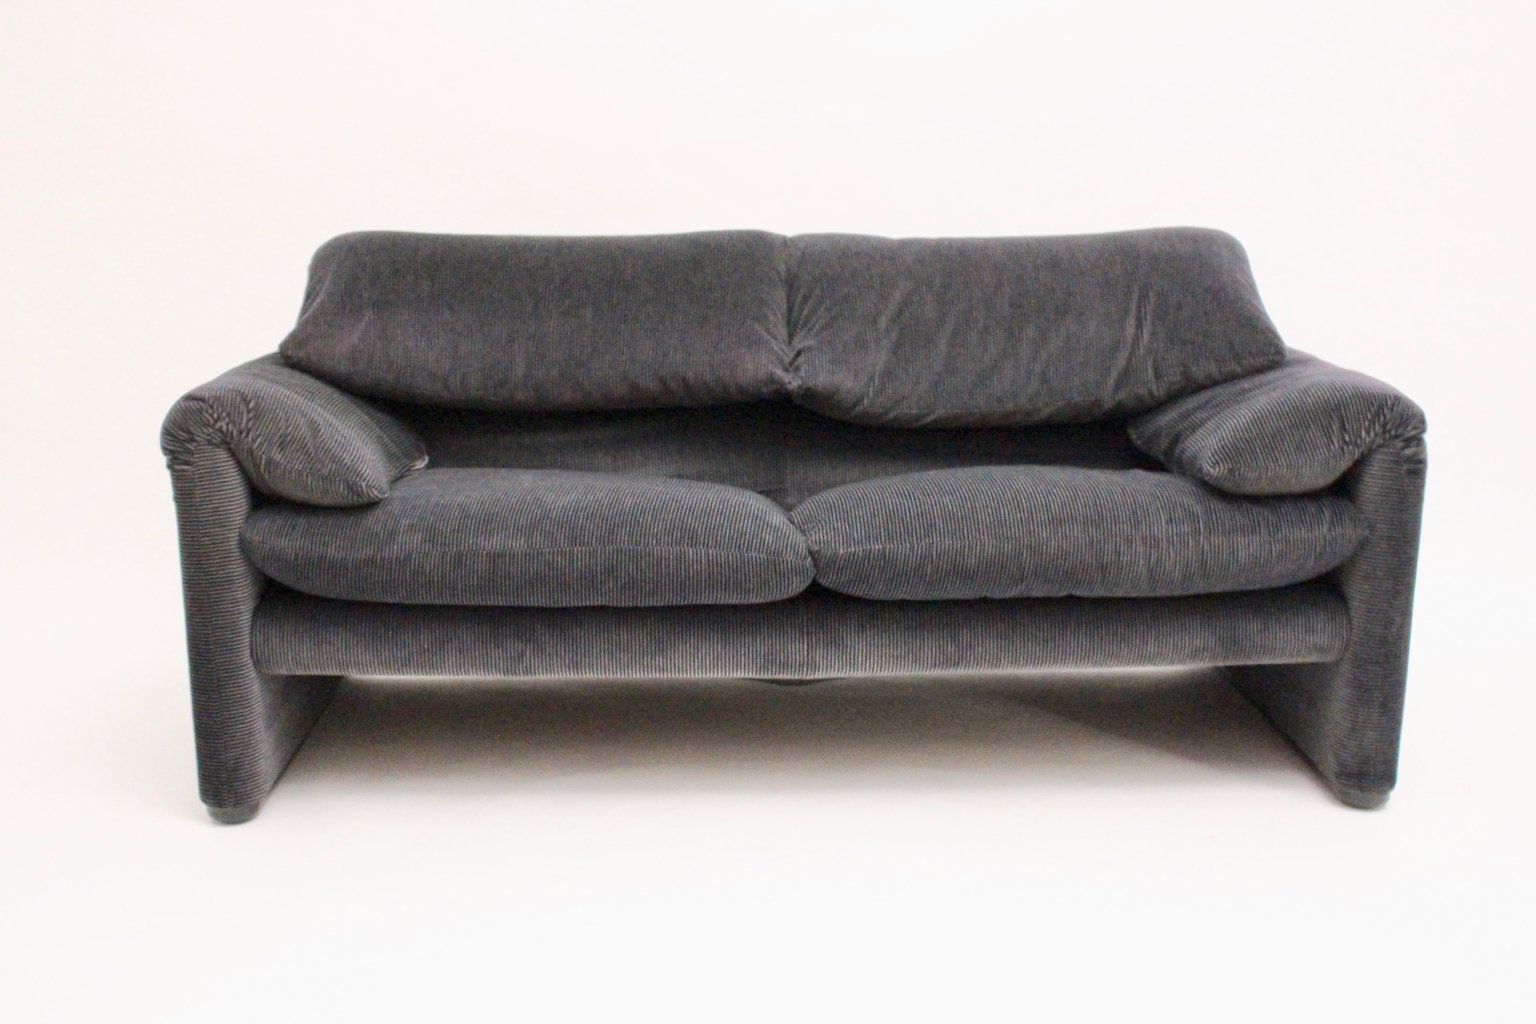 2-Sitzer Sofa Maralunga von Vico Magistretti für Cassina, 2er Set